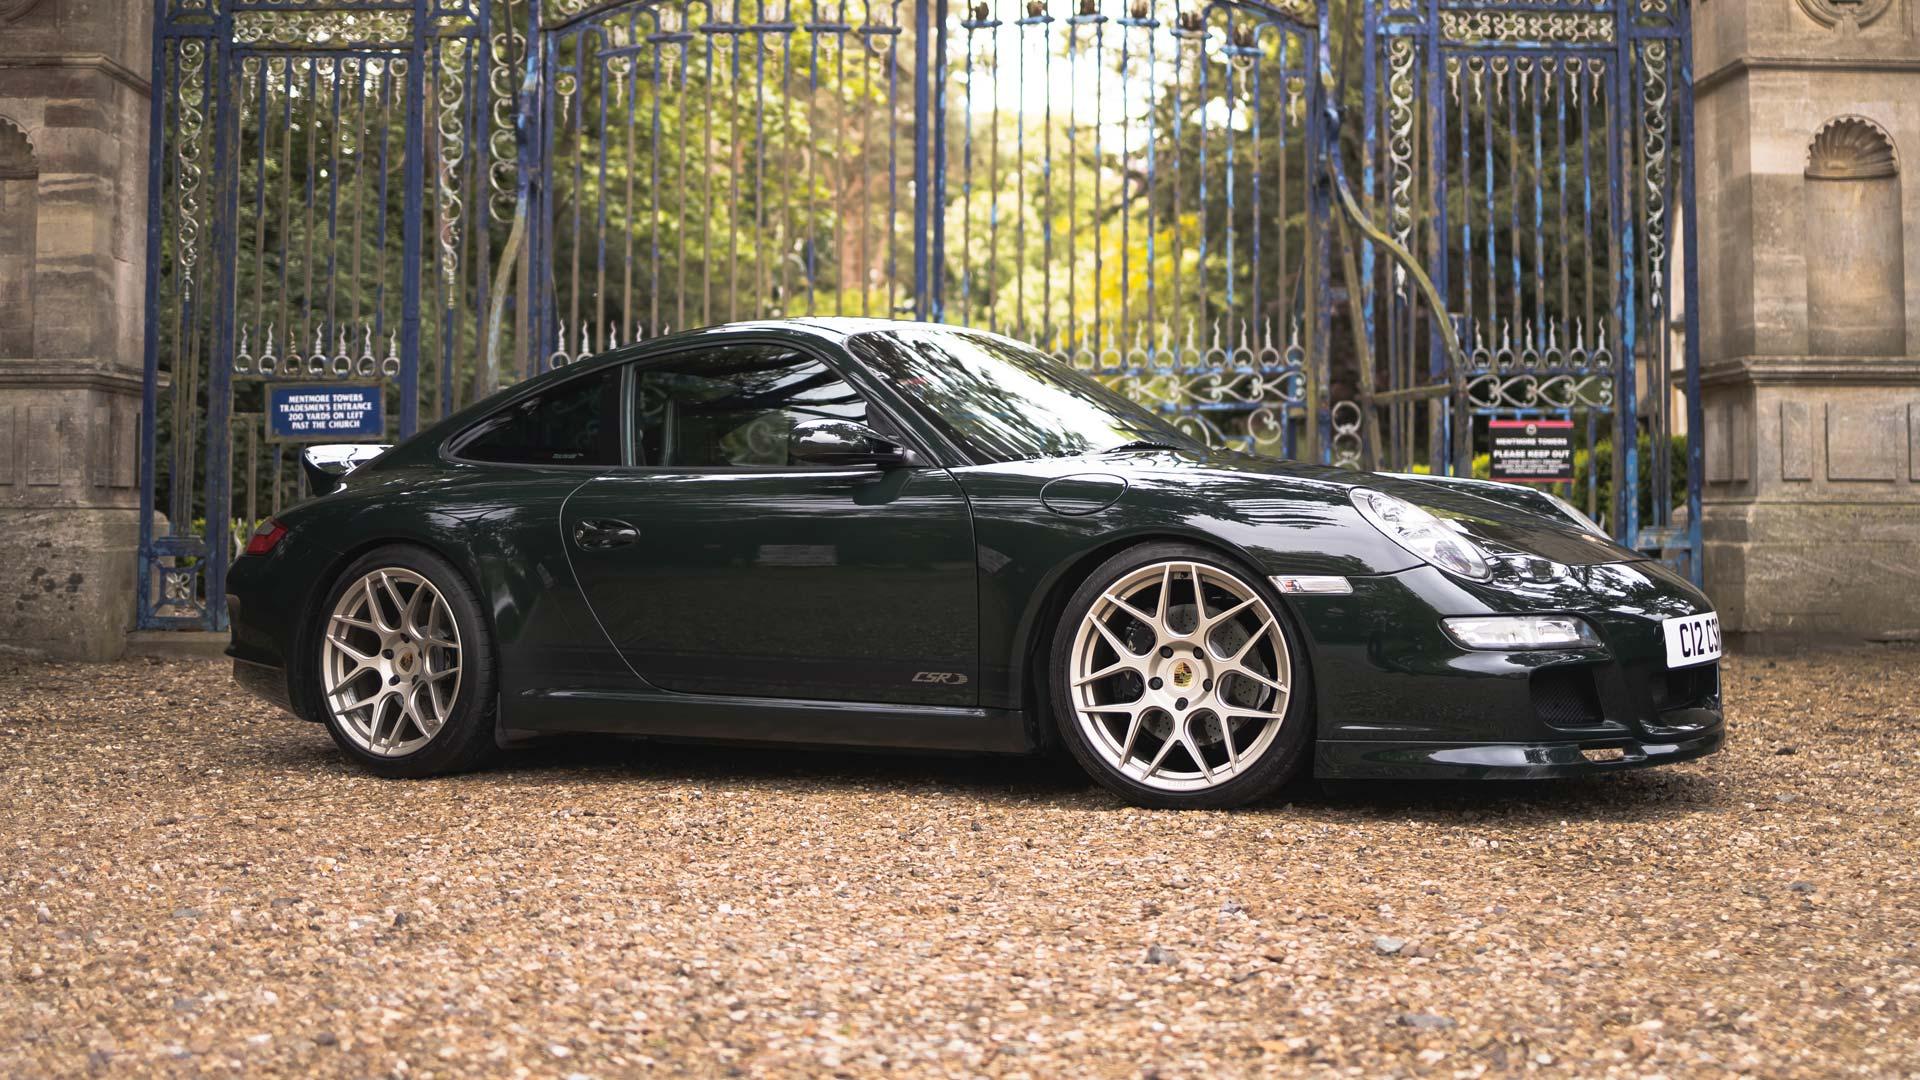 Porsche 997 CSR